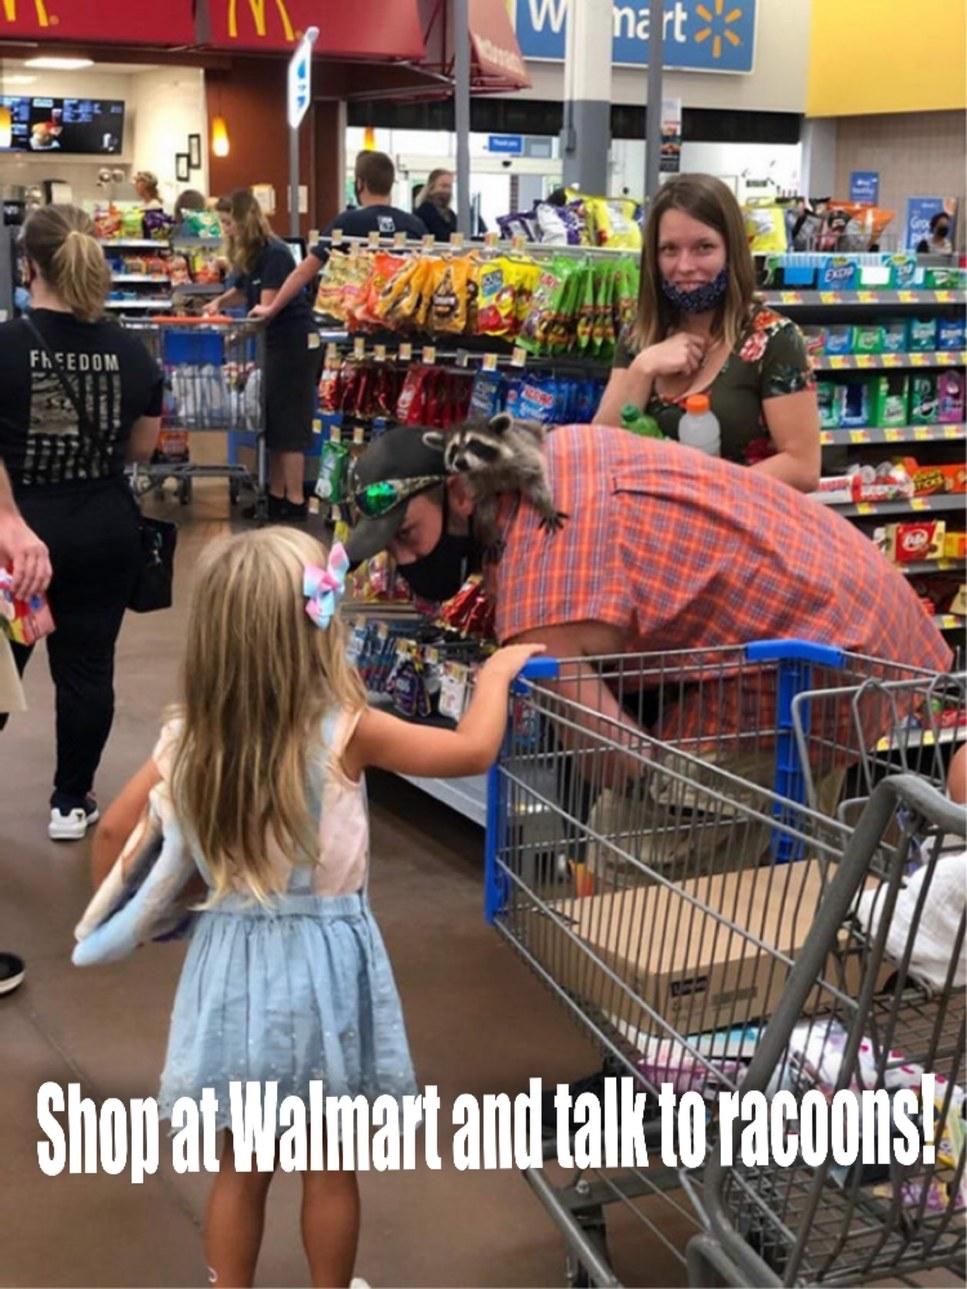 Meet the folks at Walmart - meme